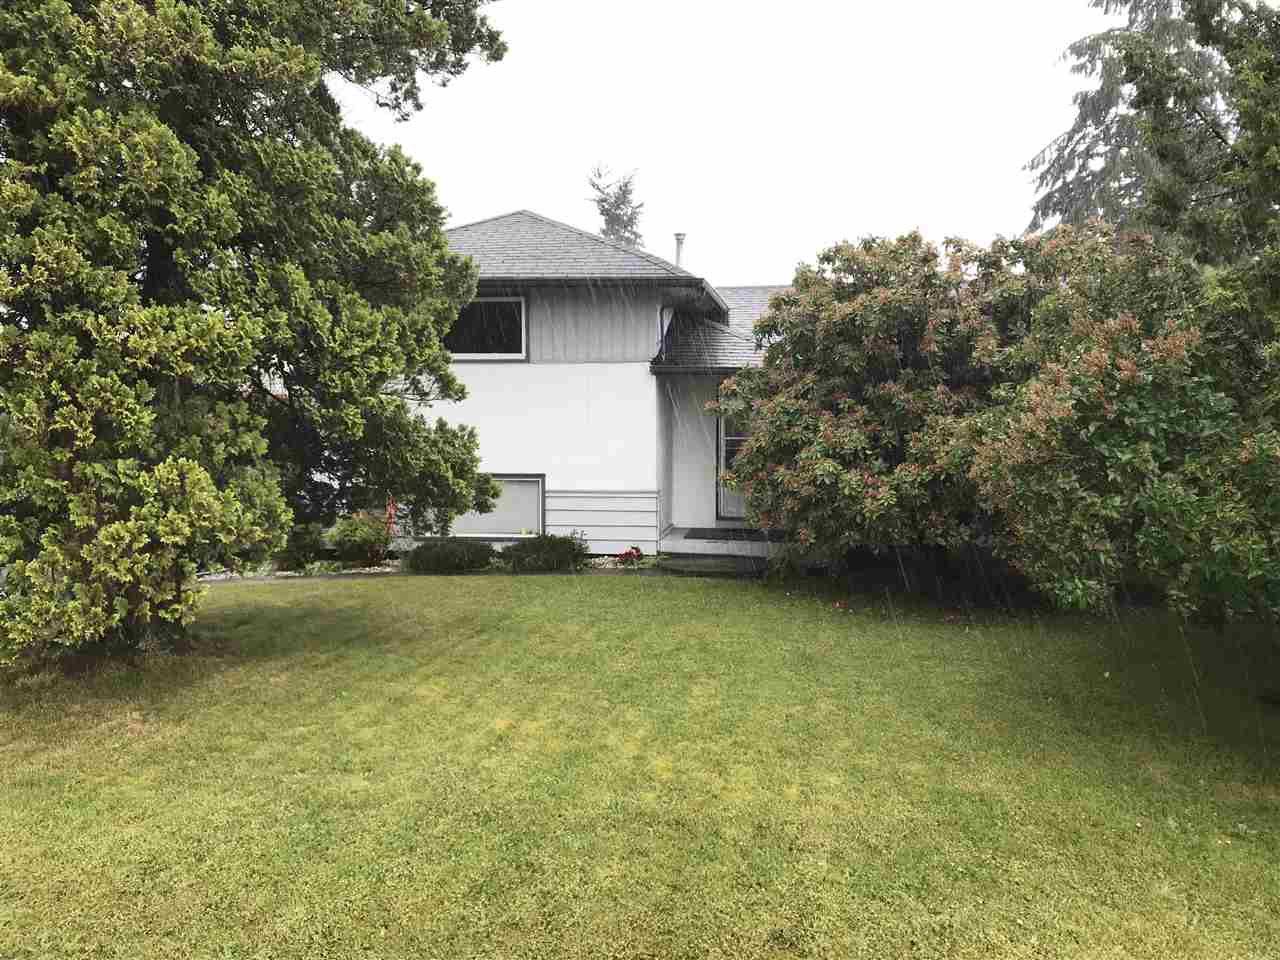 Photo 4: Photos: 9757 123 Street in Surrey: Cedar Hills House for sale (North Surrey)  : MLS®# R2279897